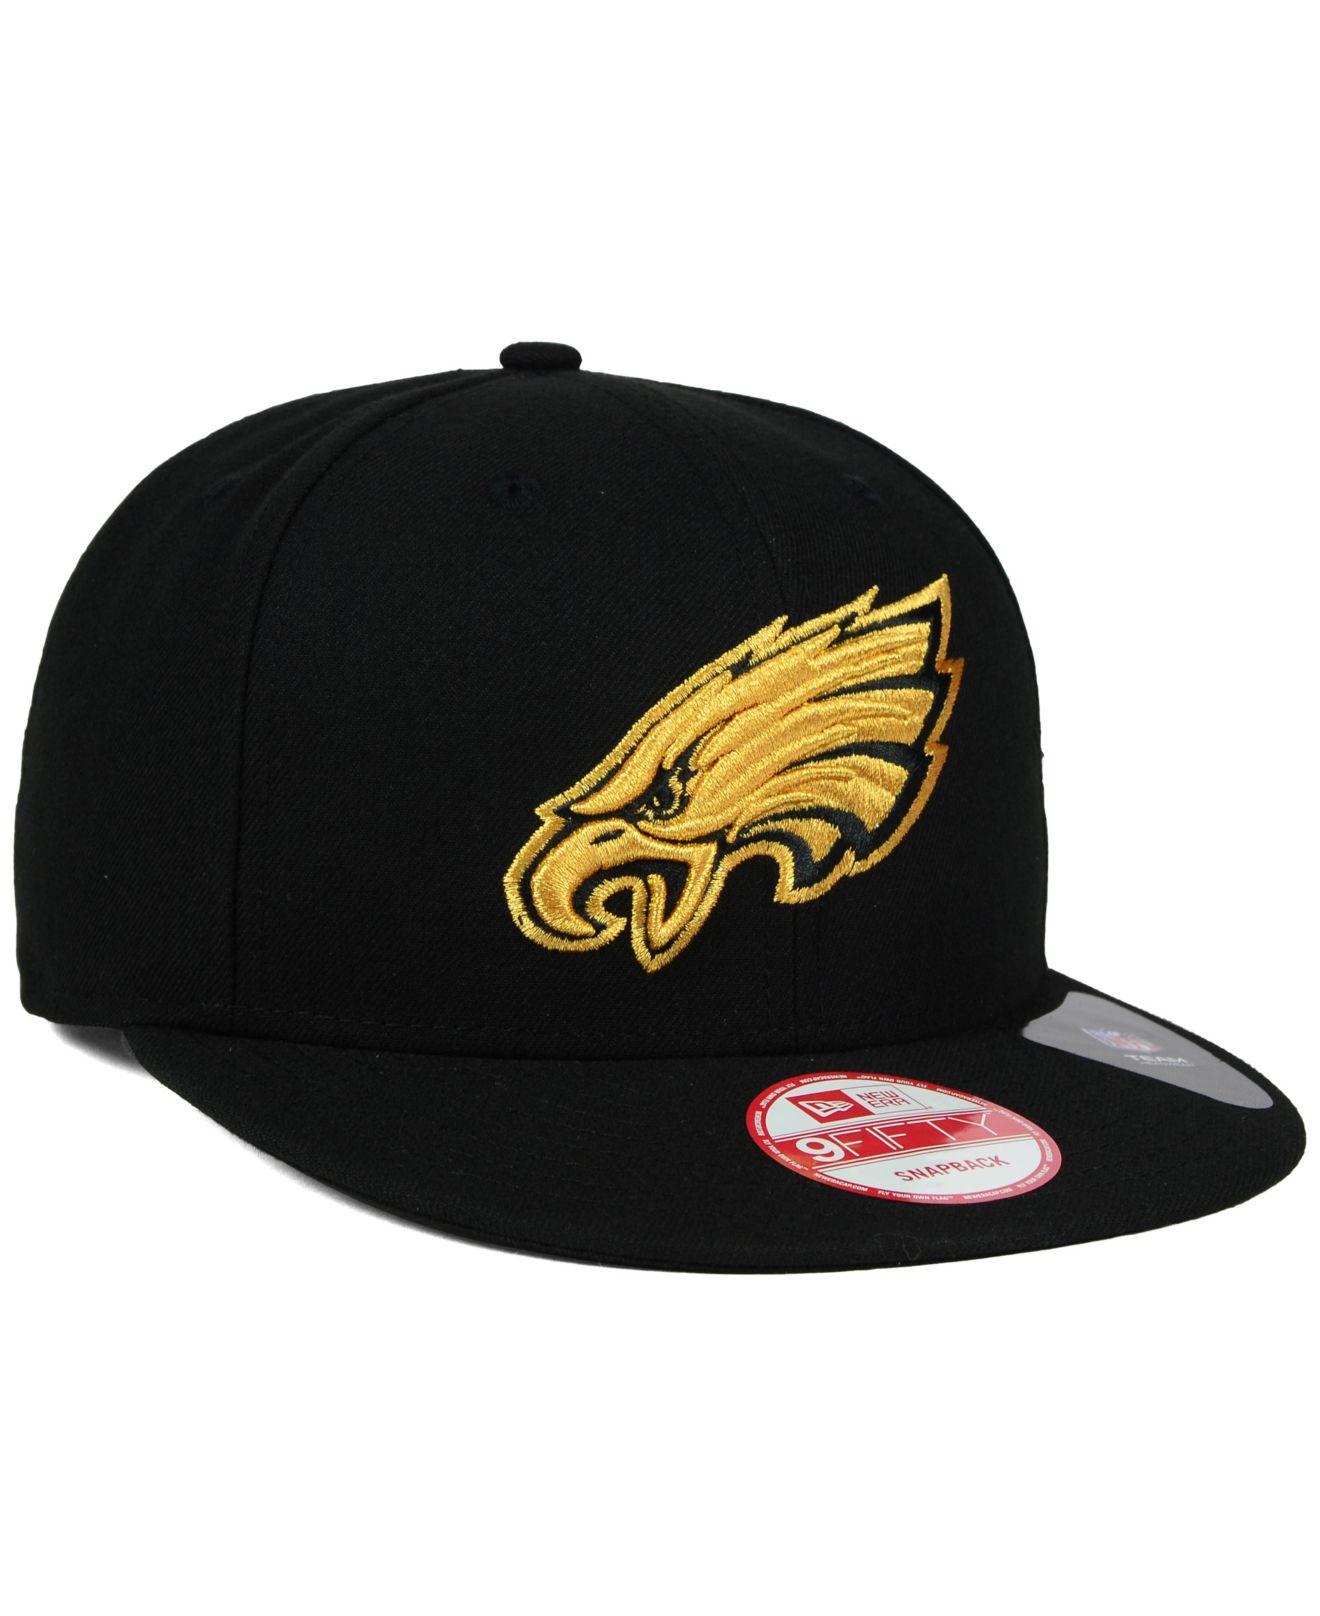 6a257bc143d83 ... free shipping lyst ktz philadelphia eagles black metallic gold 9fifty  snapback 8f689 5316f